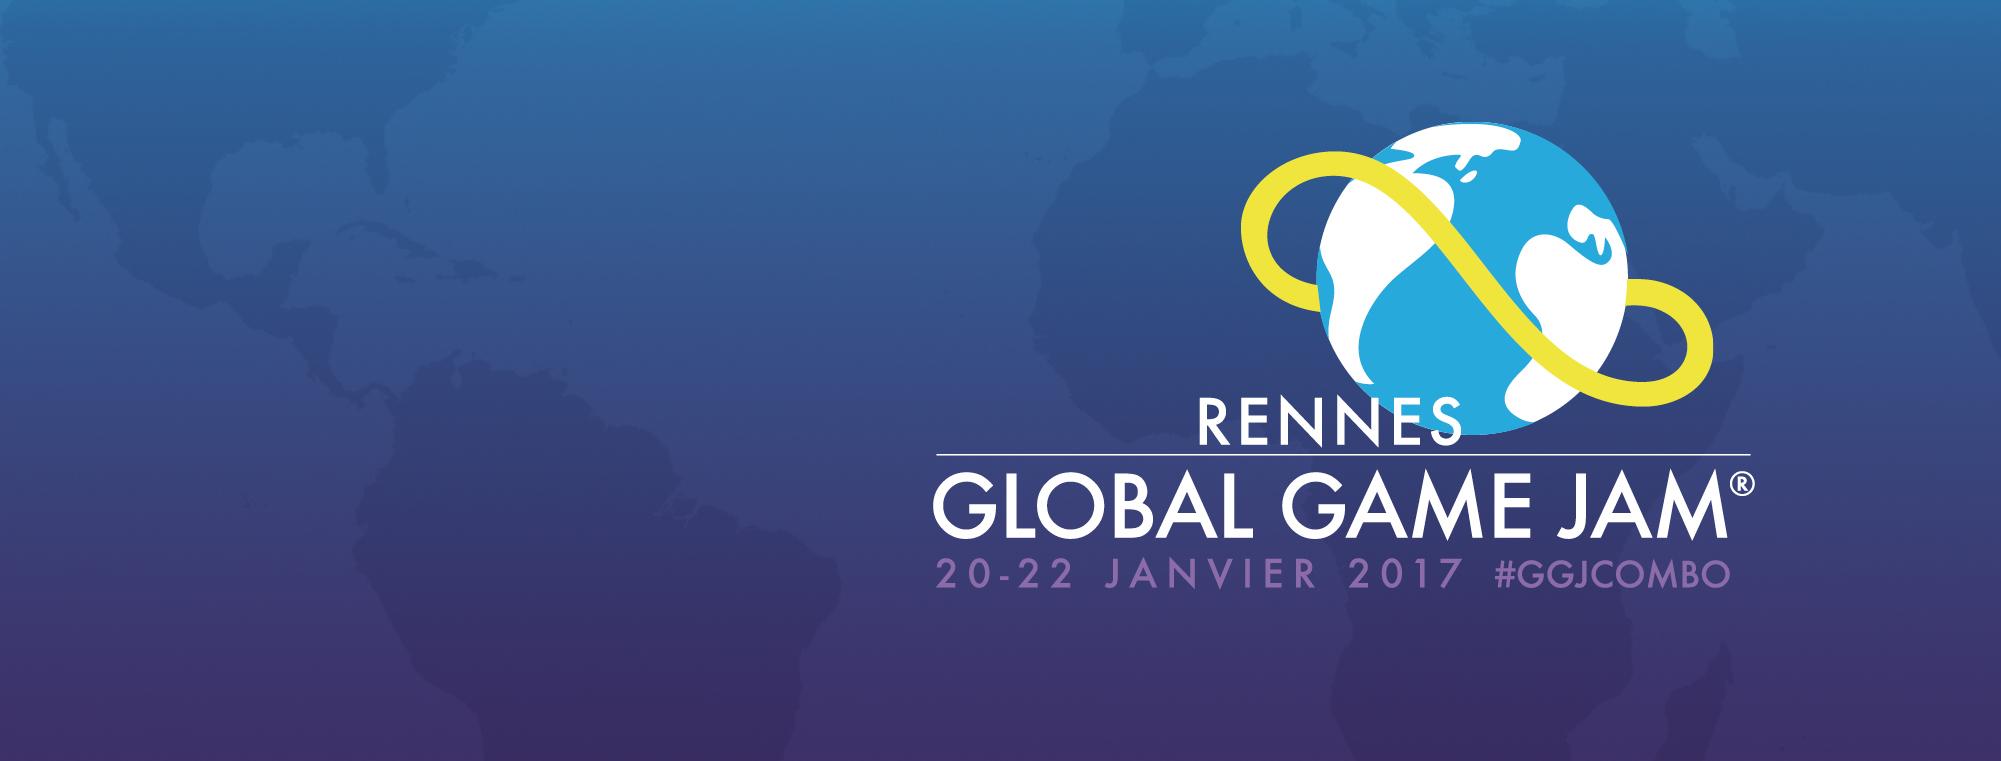 GGJ2017-Rennes